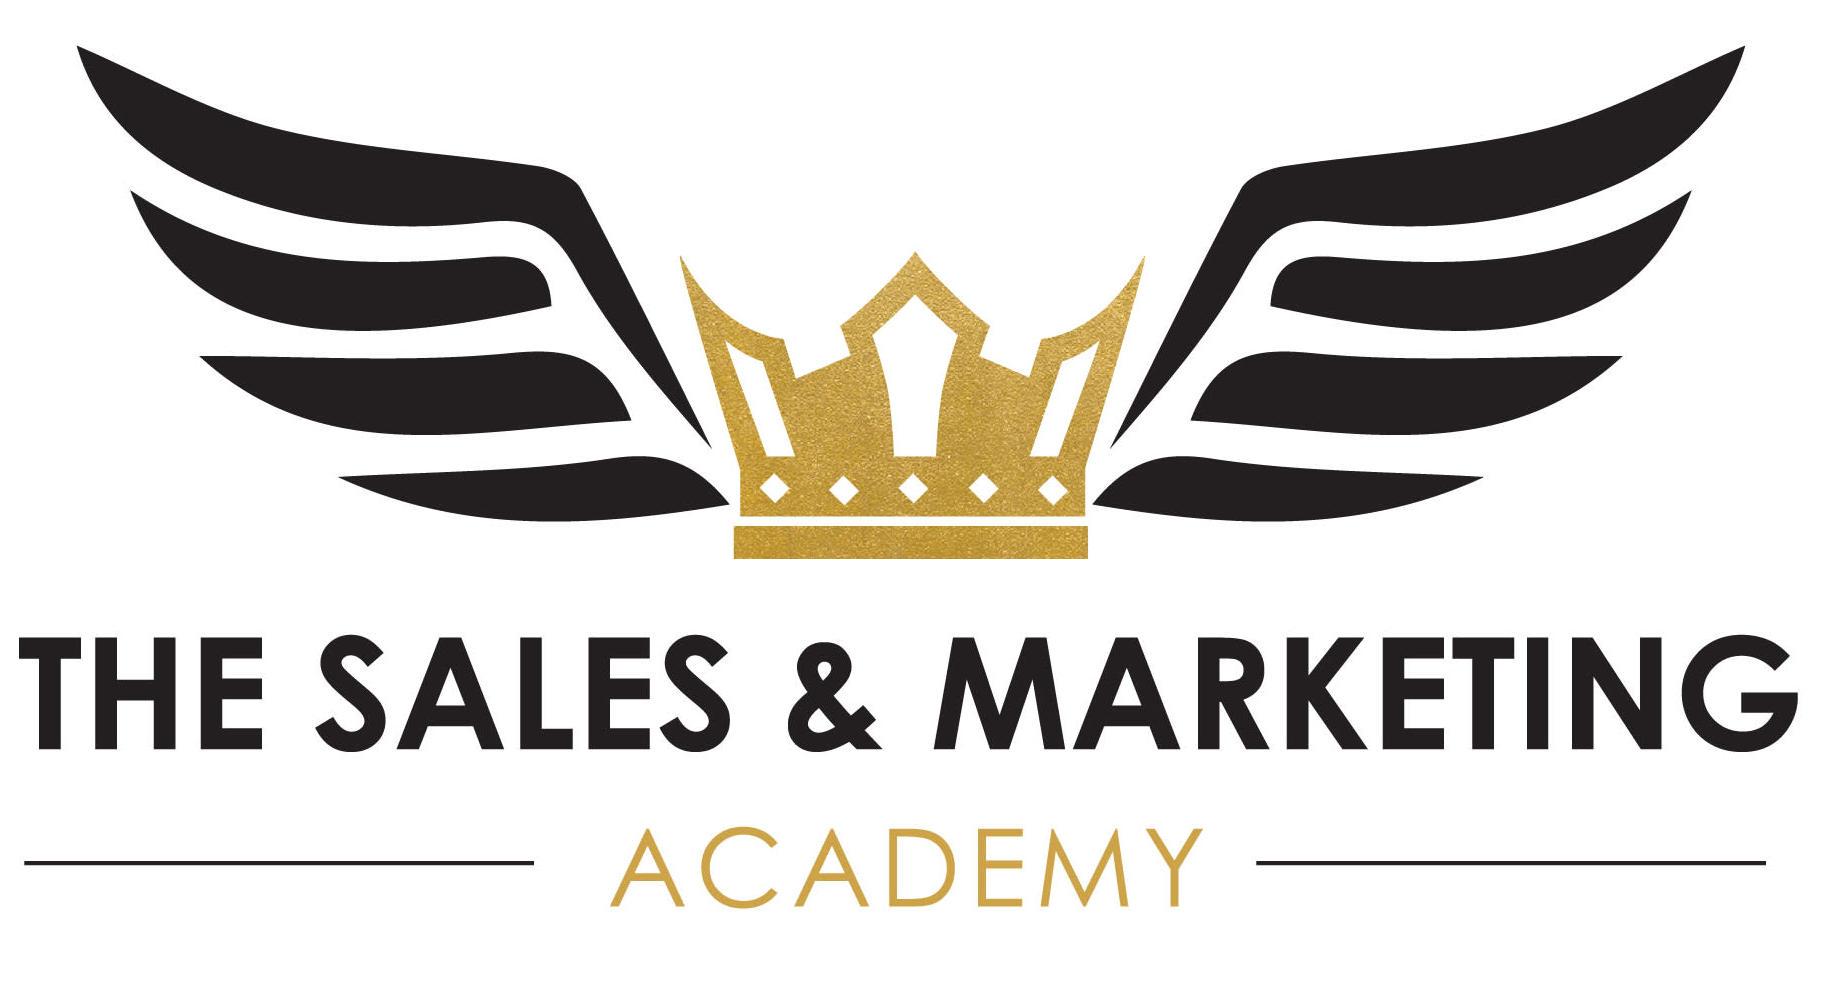 The Sales & Marketing Academy